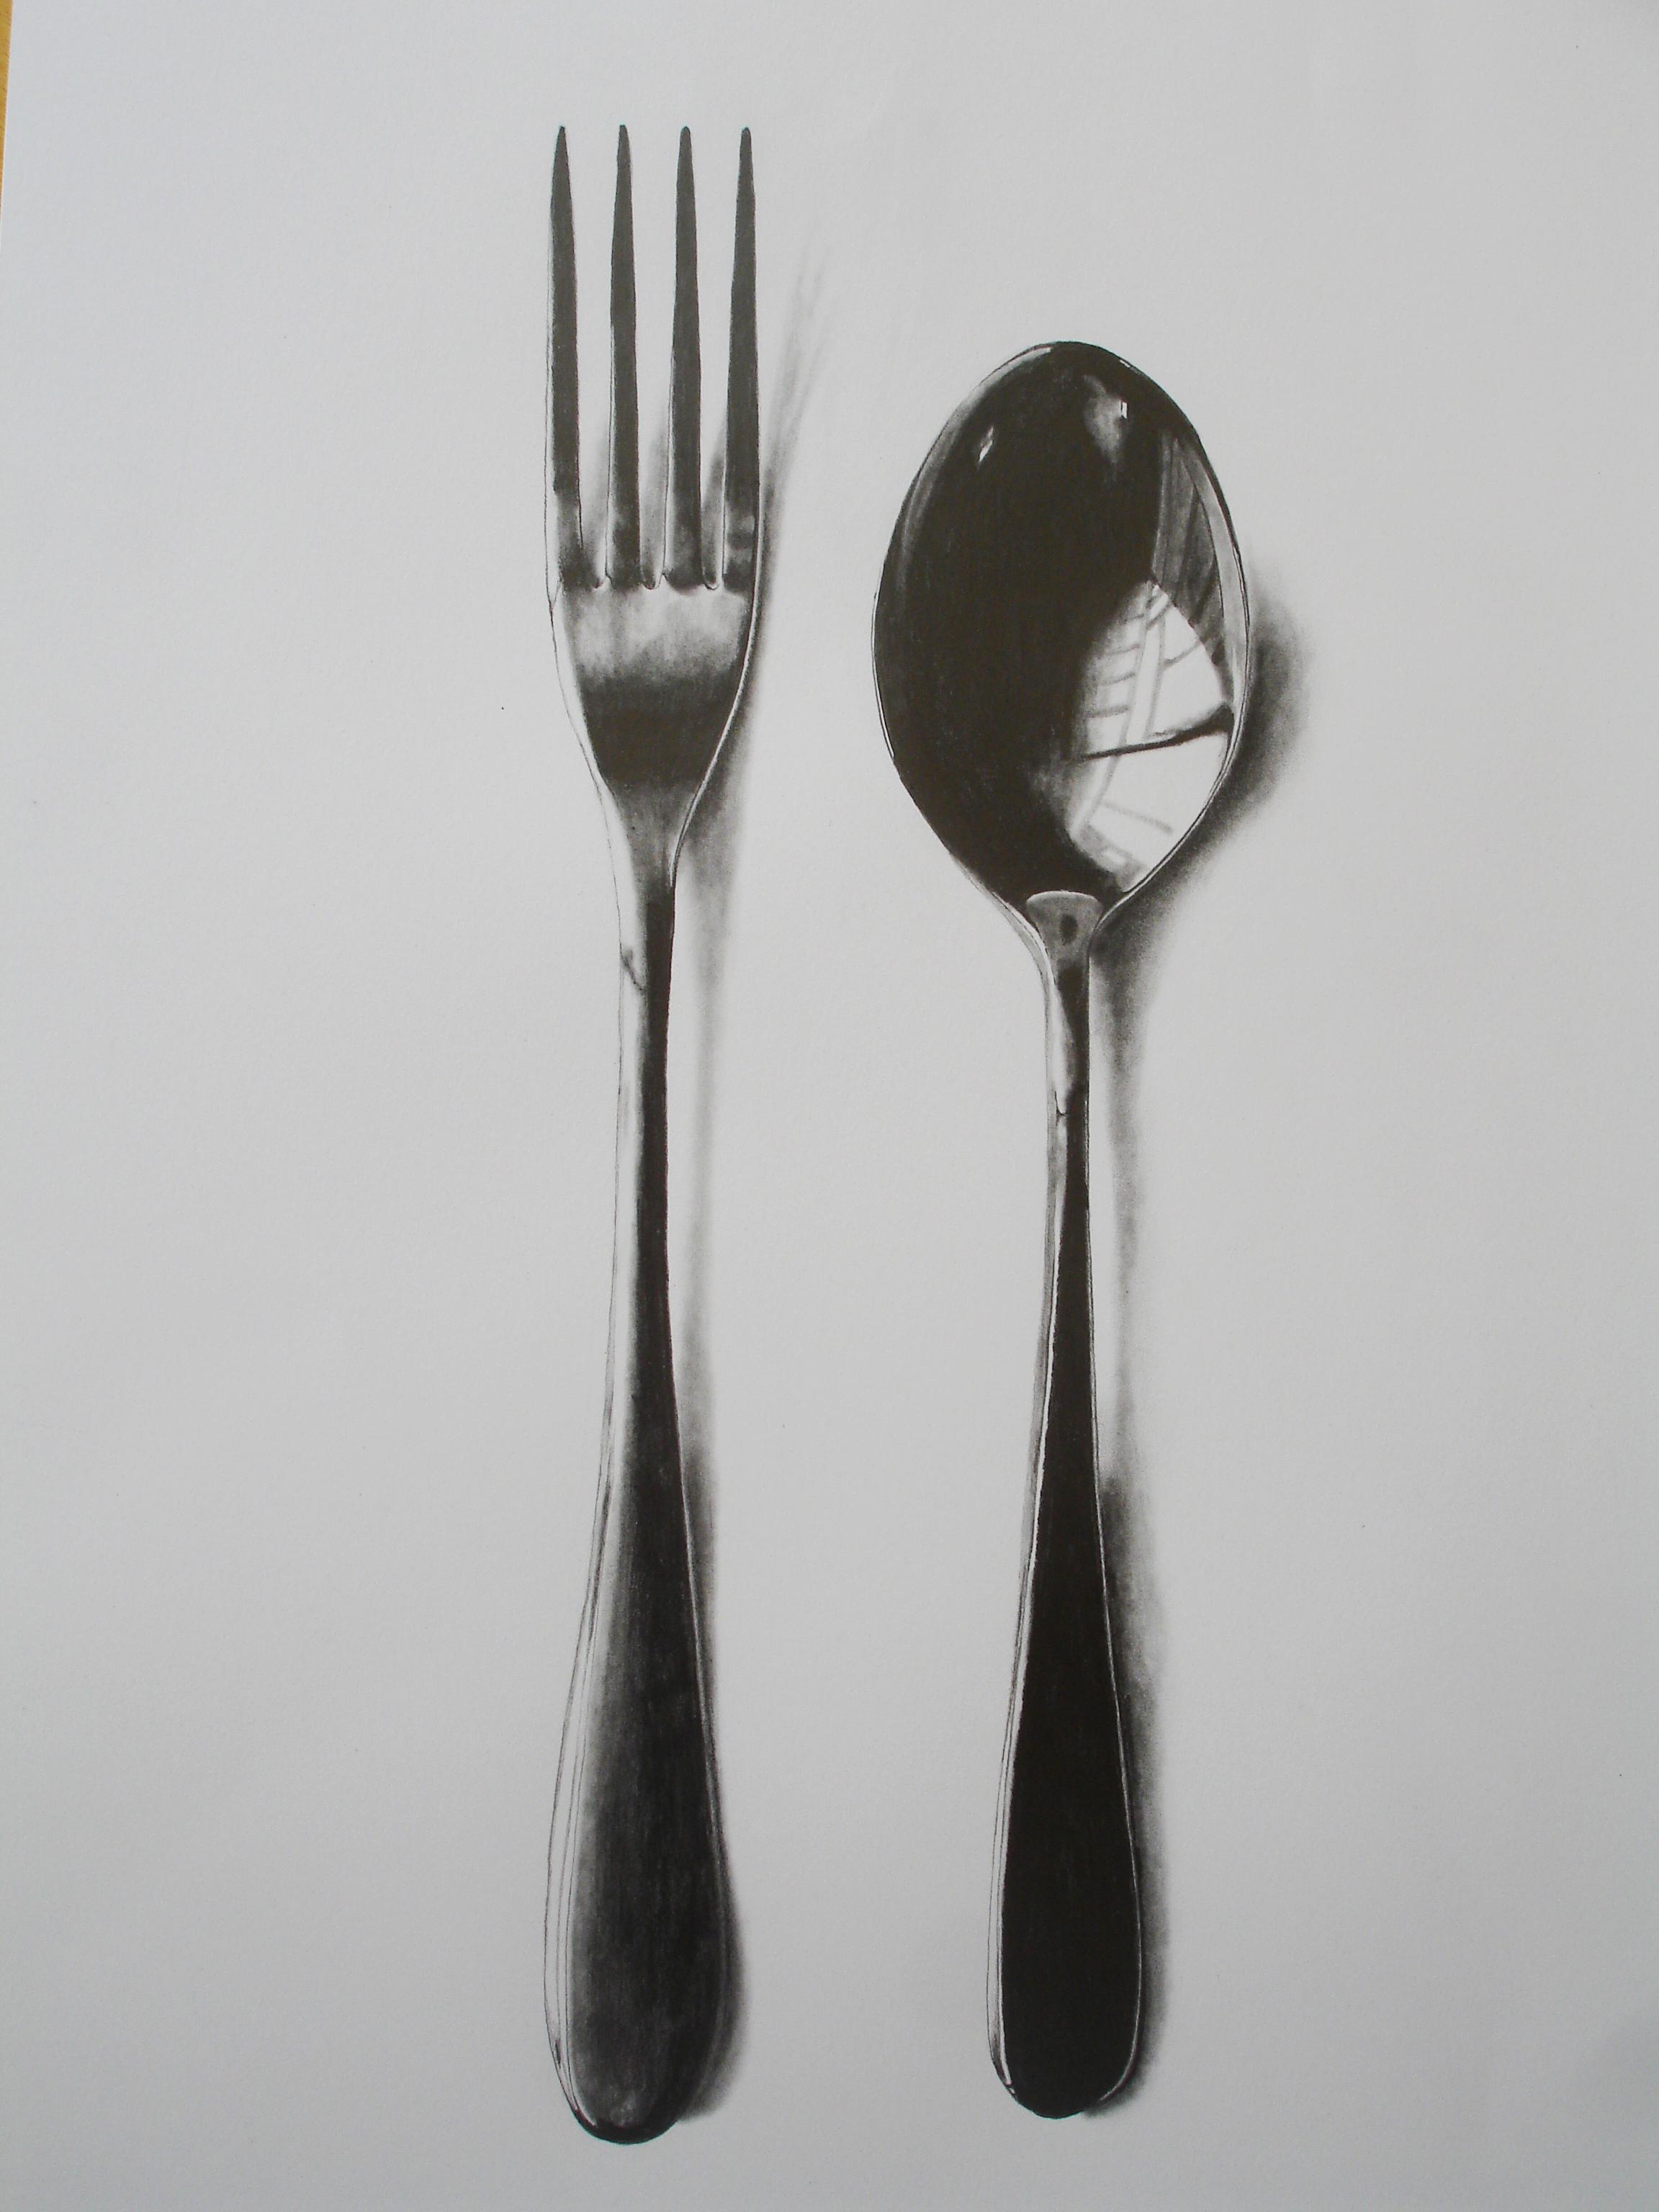 Drawn spoon cutlery Of janbrewerton brewerton co drawing